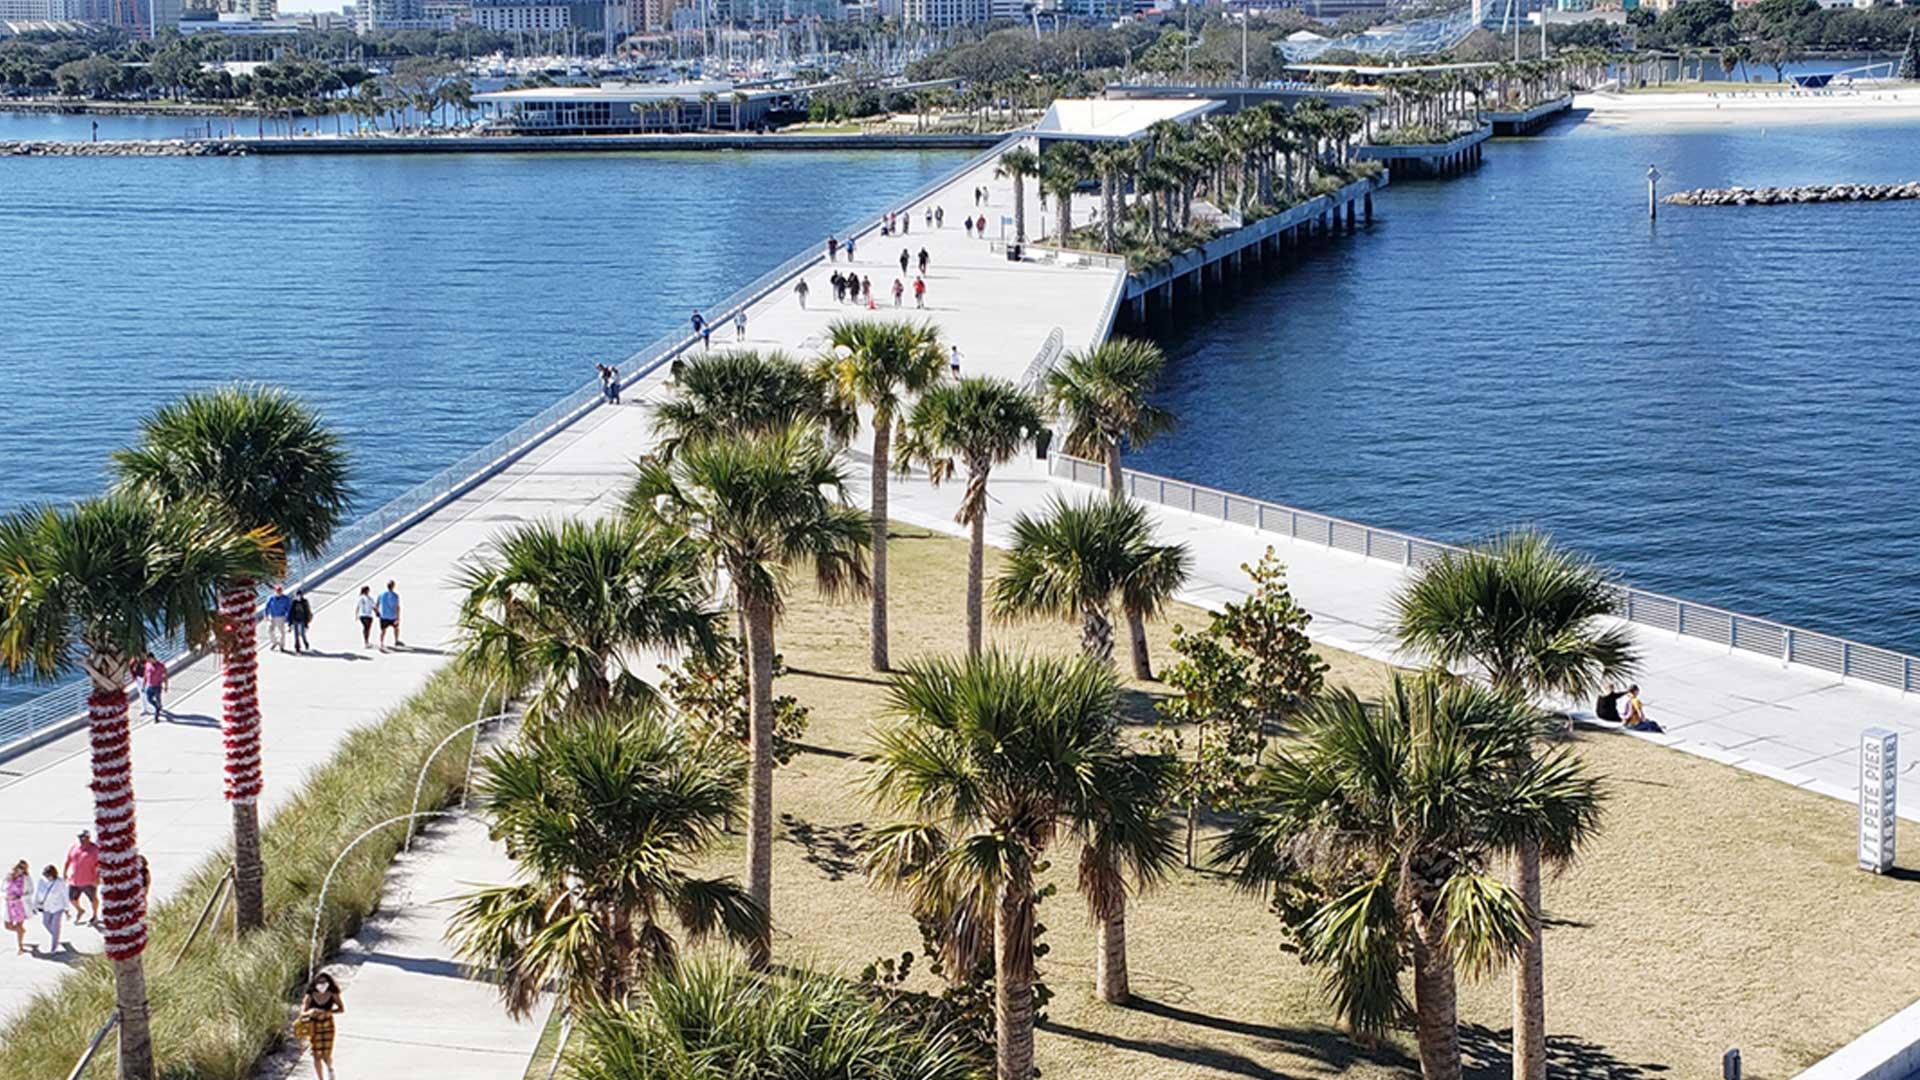 aerial photograph of people walking on the St. Petersburg pier in downtown St. Petersburg, Florida